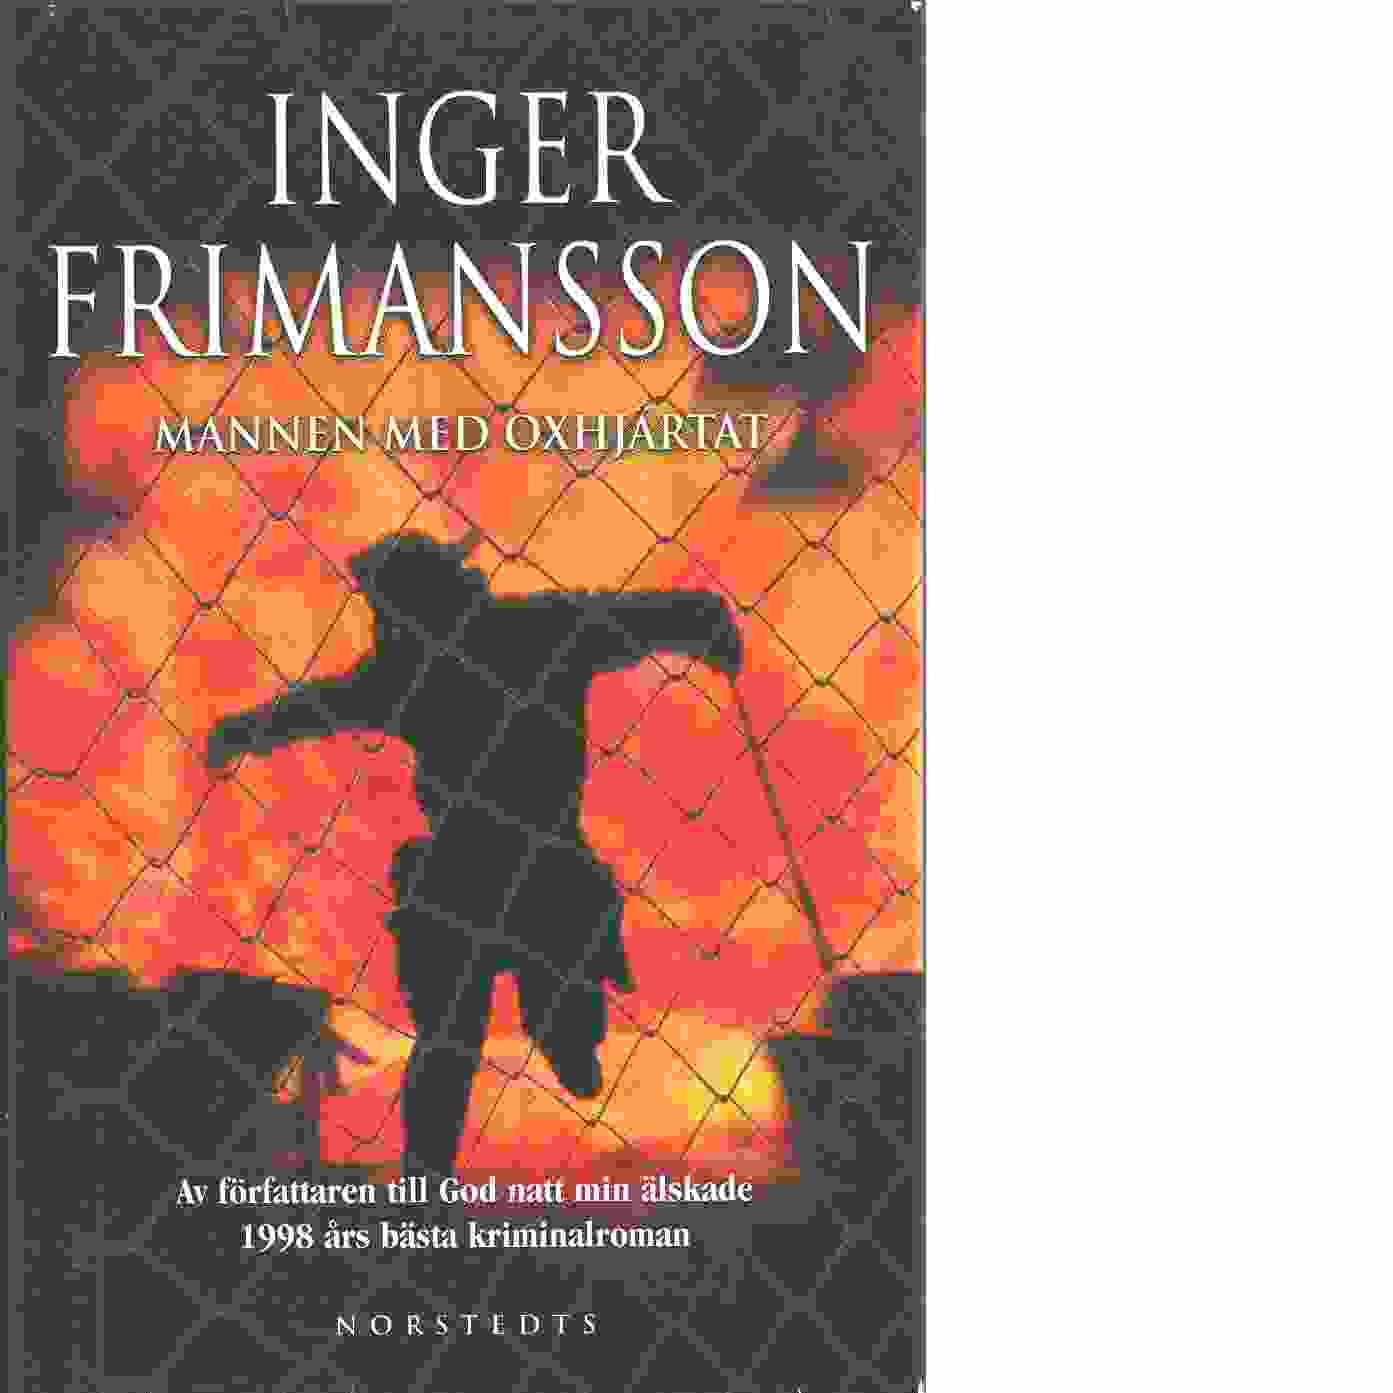 Mannen med oxhjärtat - Frimansson, Inger